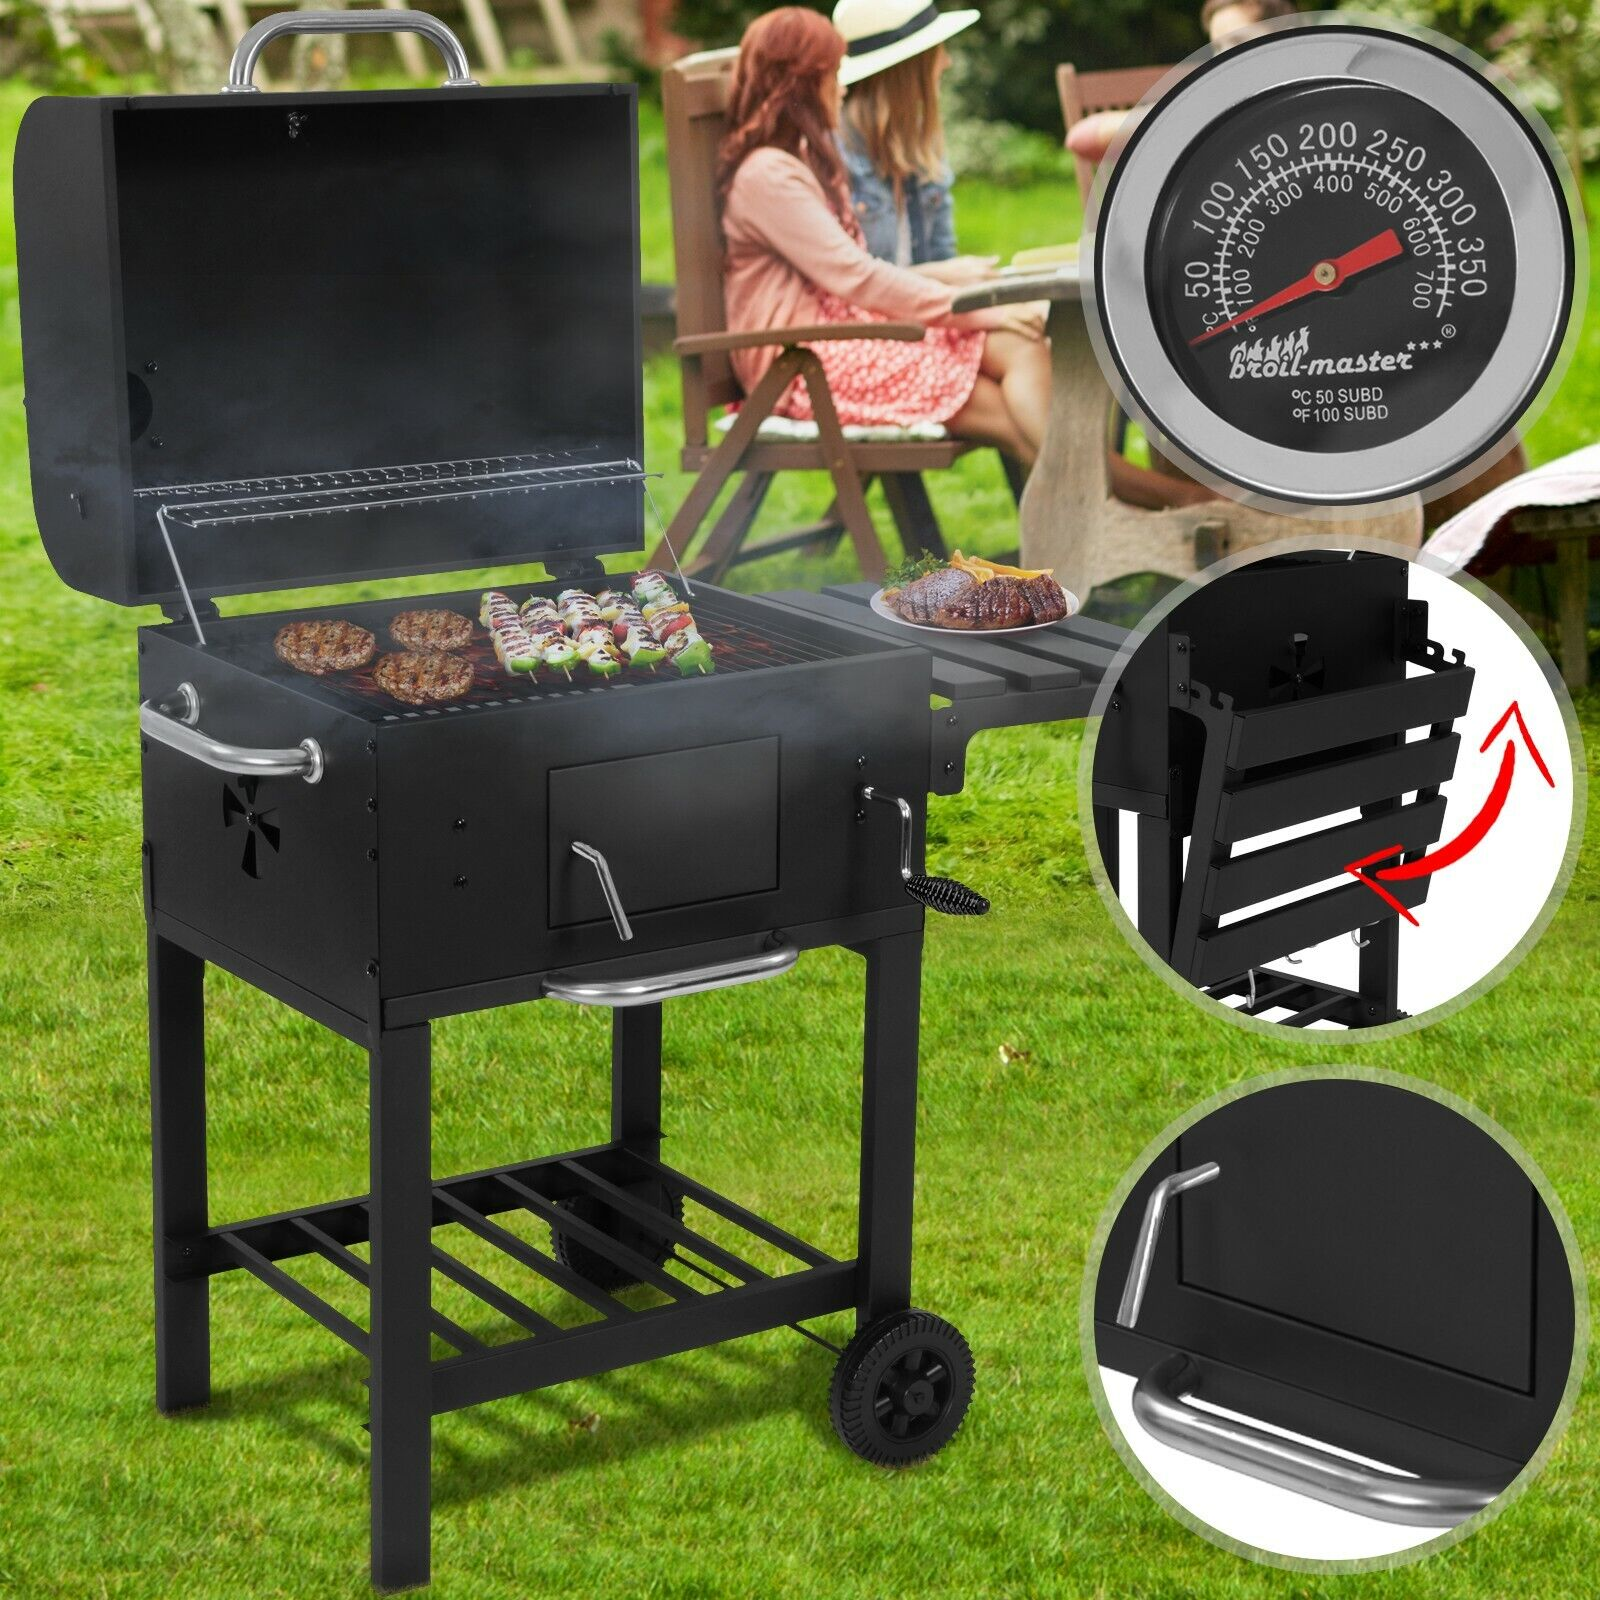 Holzkohlegrill XL Grillwagen BBQ Smoker Holzkohle Barbecue Grill Grillkamin